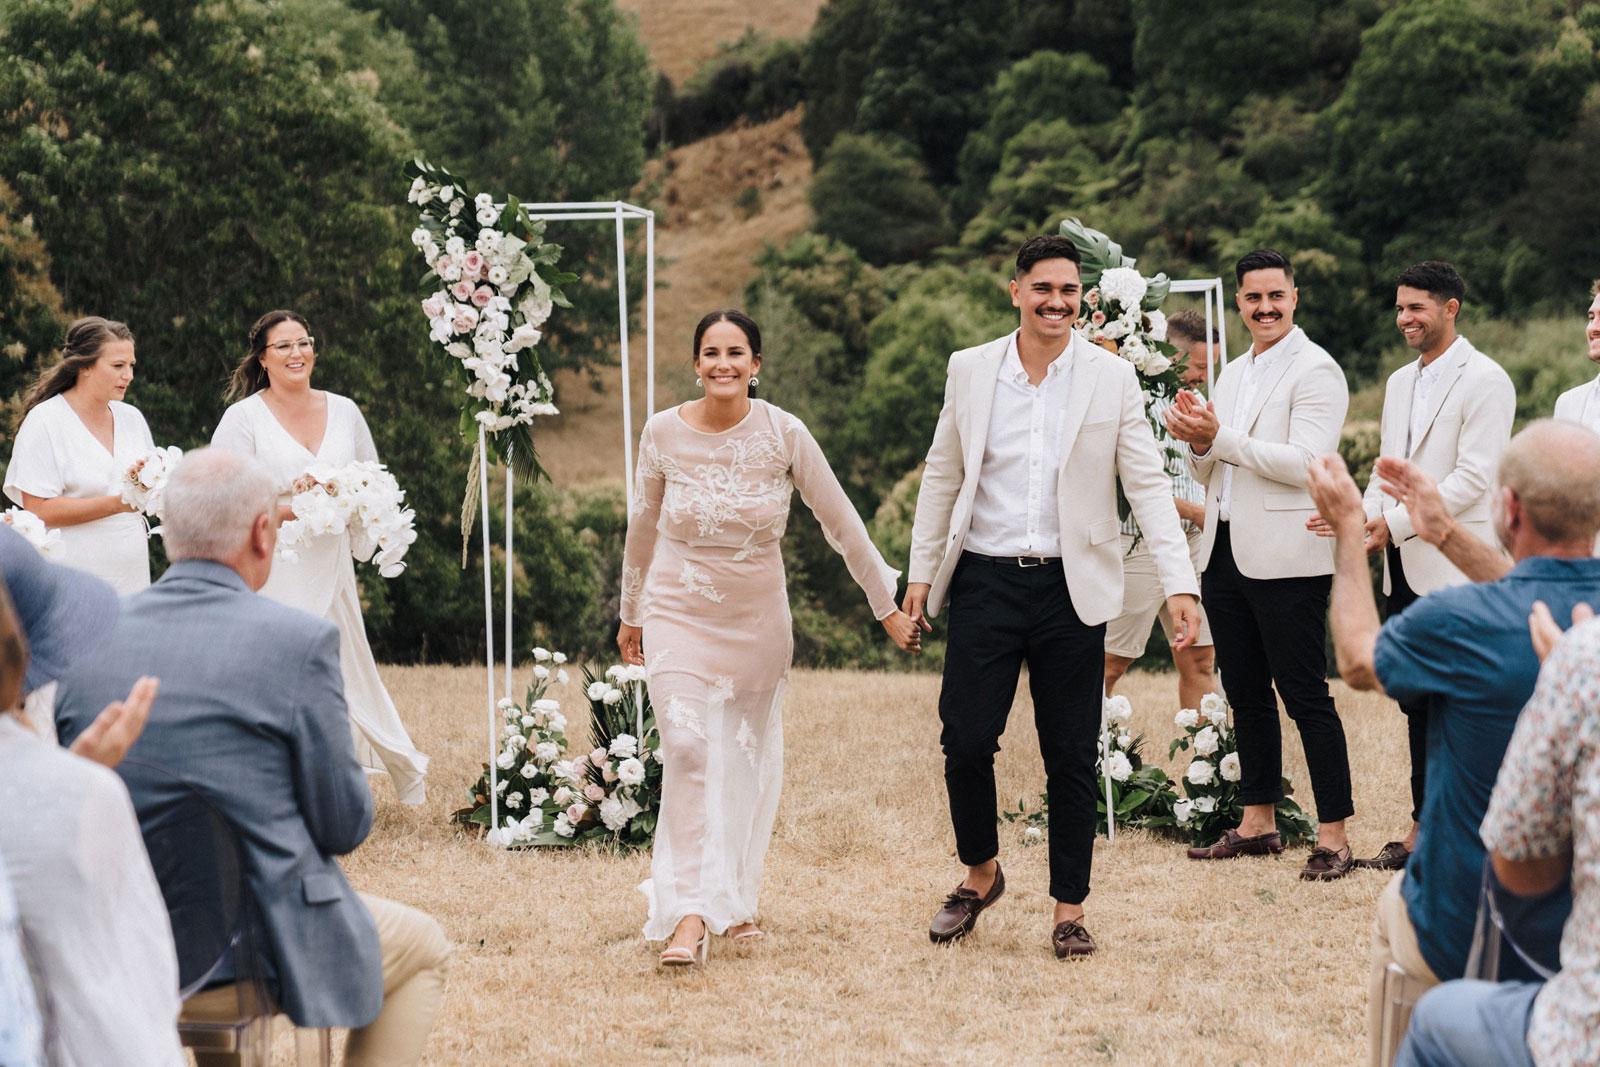 newfound-s-t-hunua-auckland-wedding-photographers-041